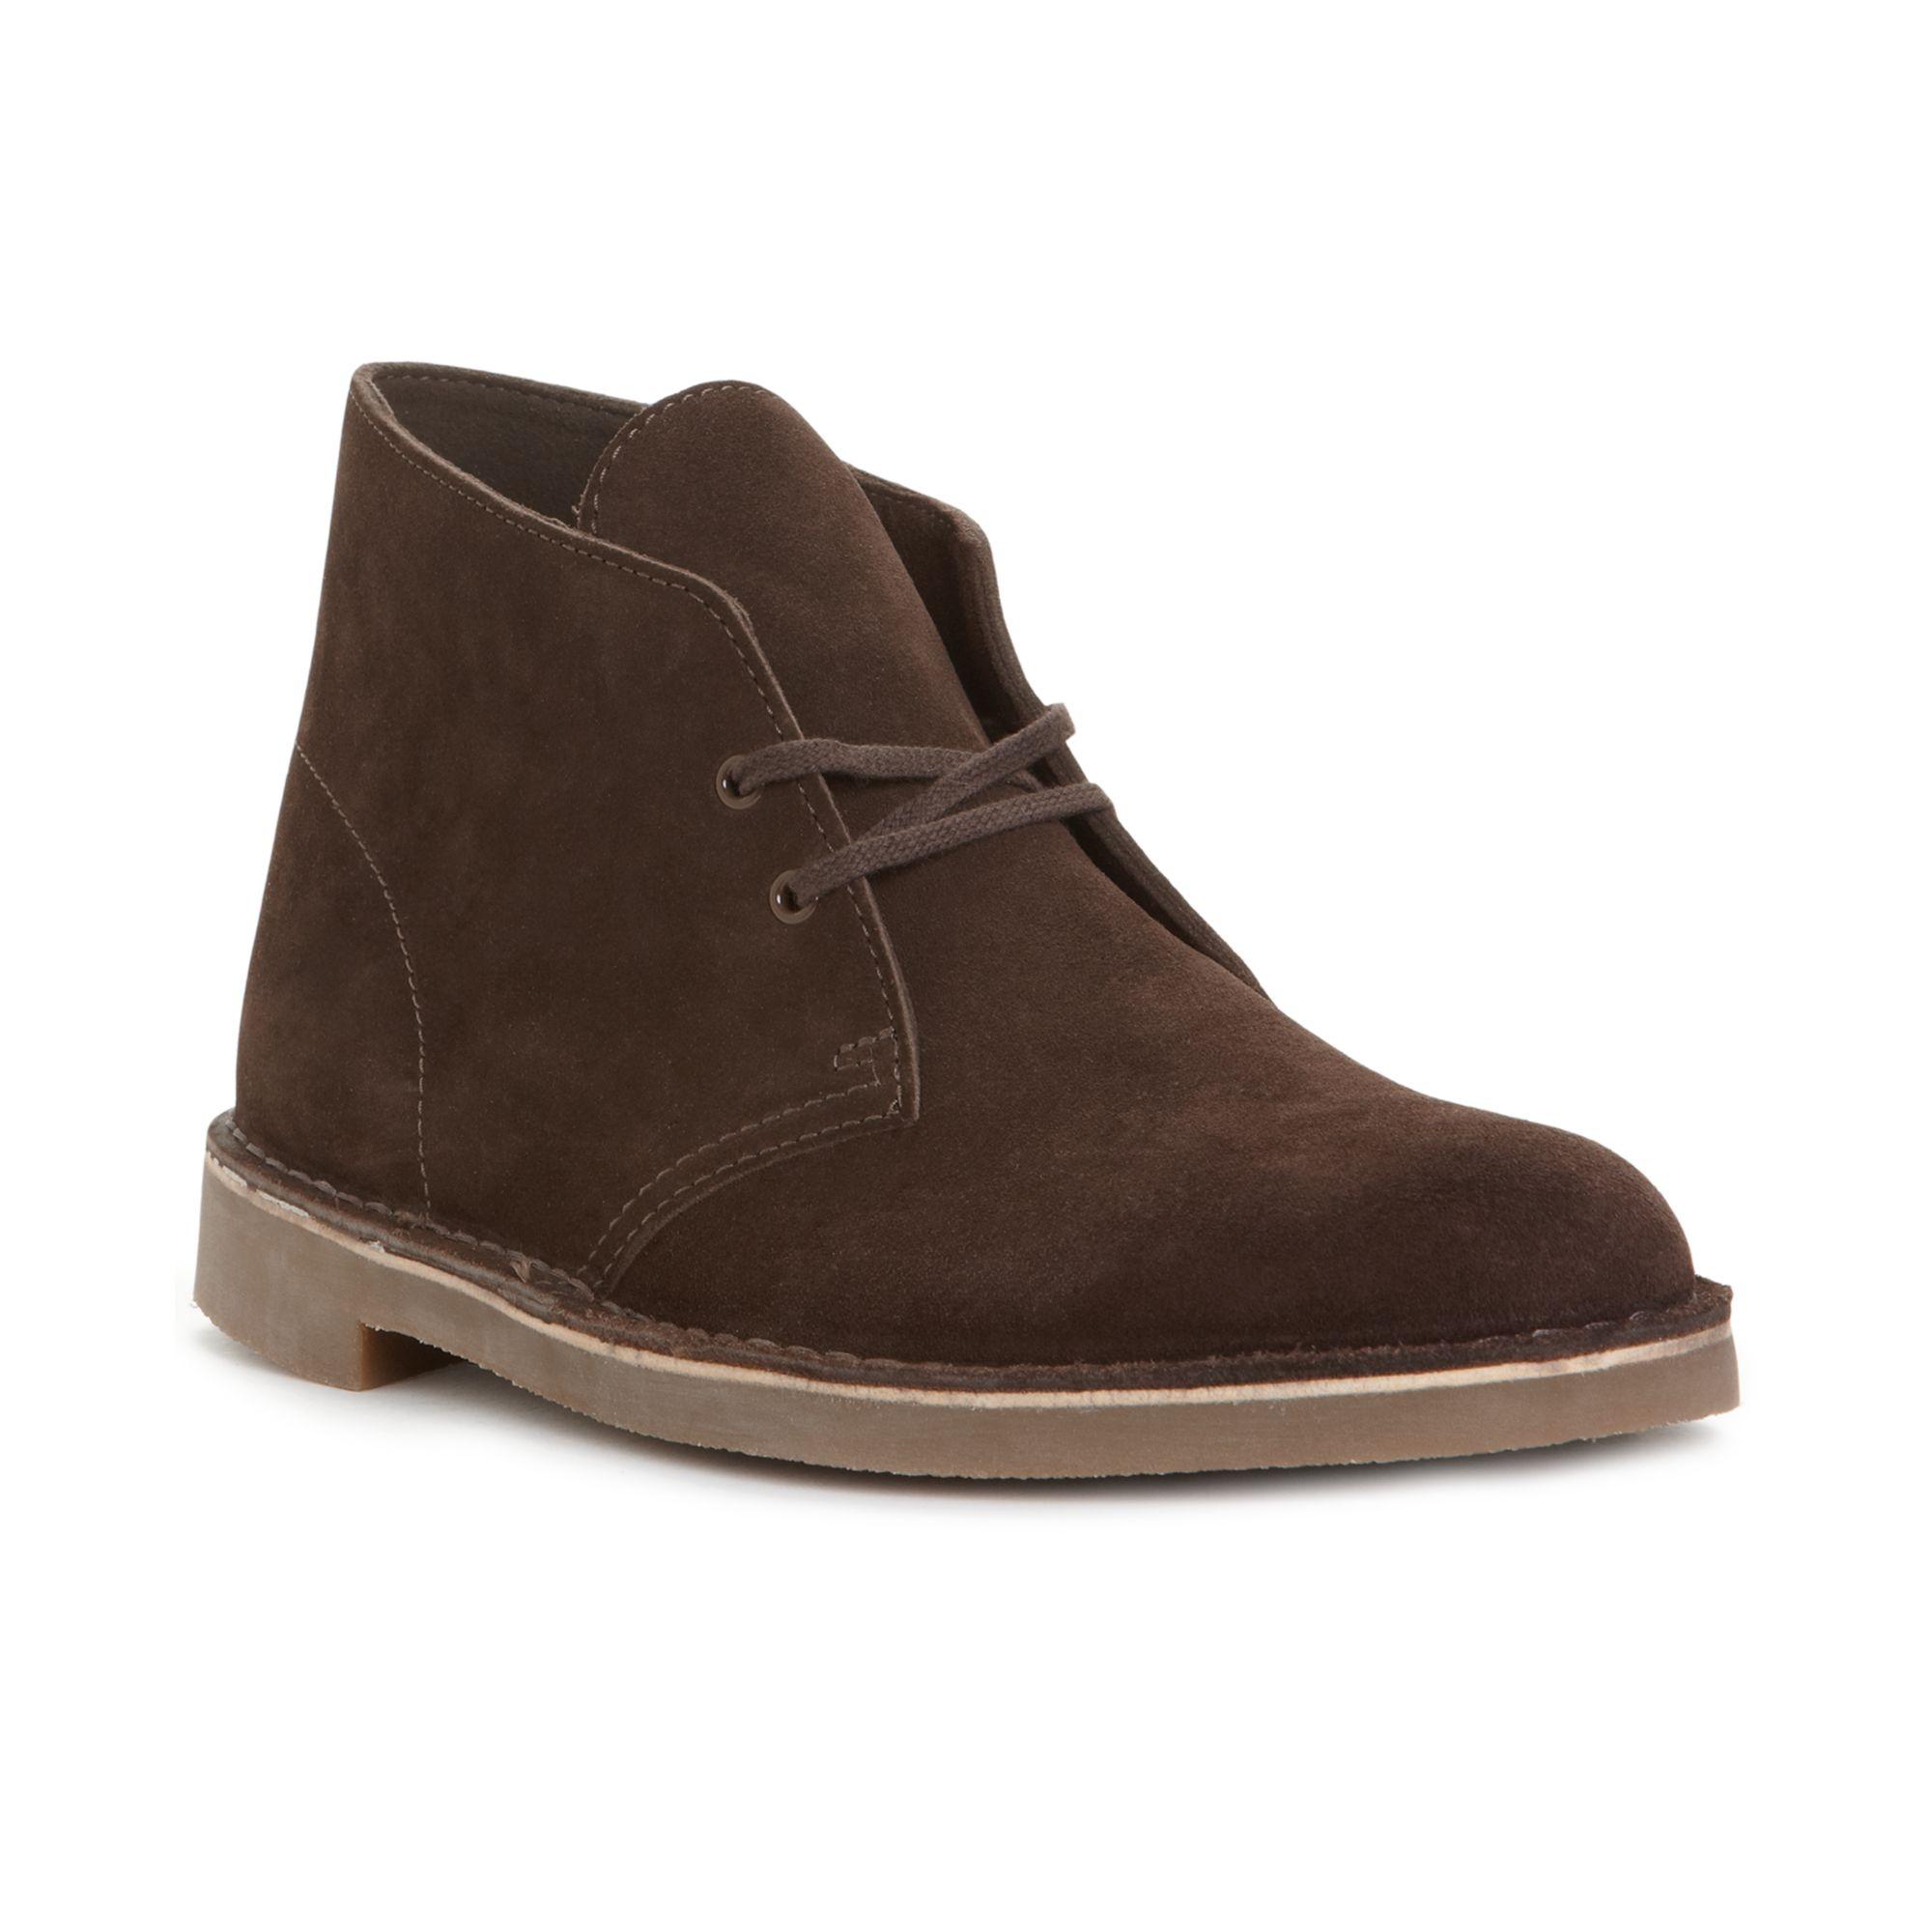 Awesome Clarks Originals Desert Chukka Boot Casual Shoe - Womens | EBay